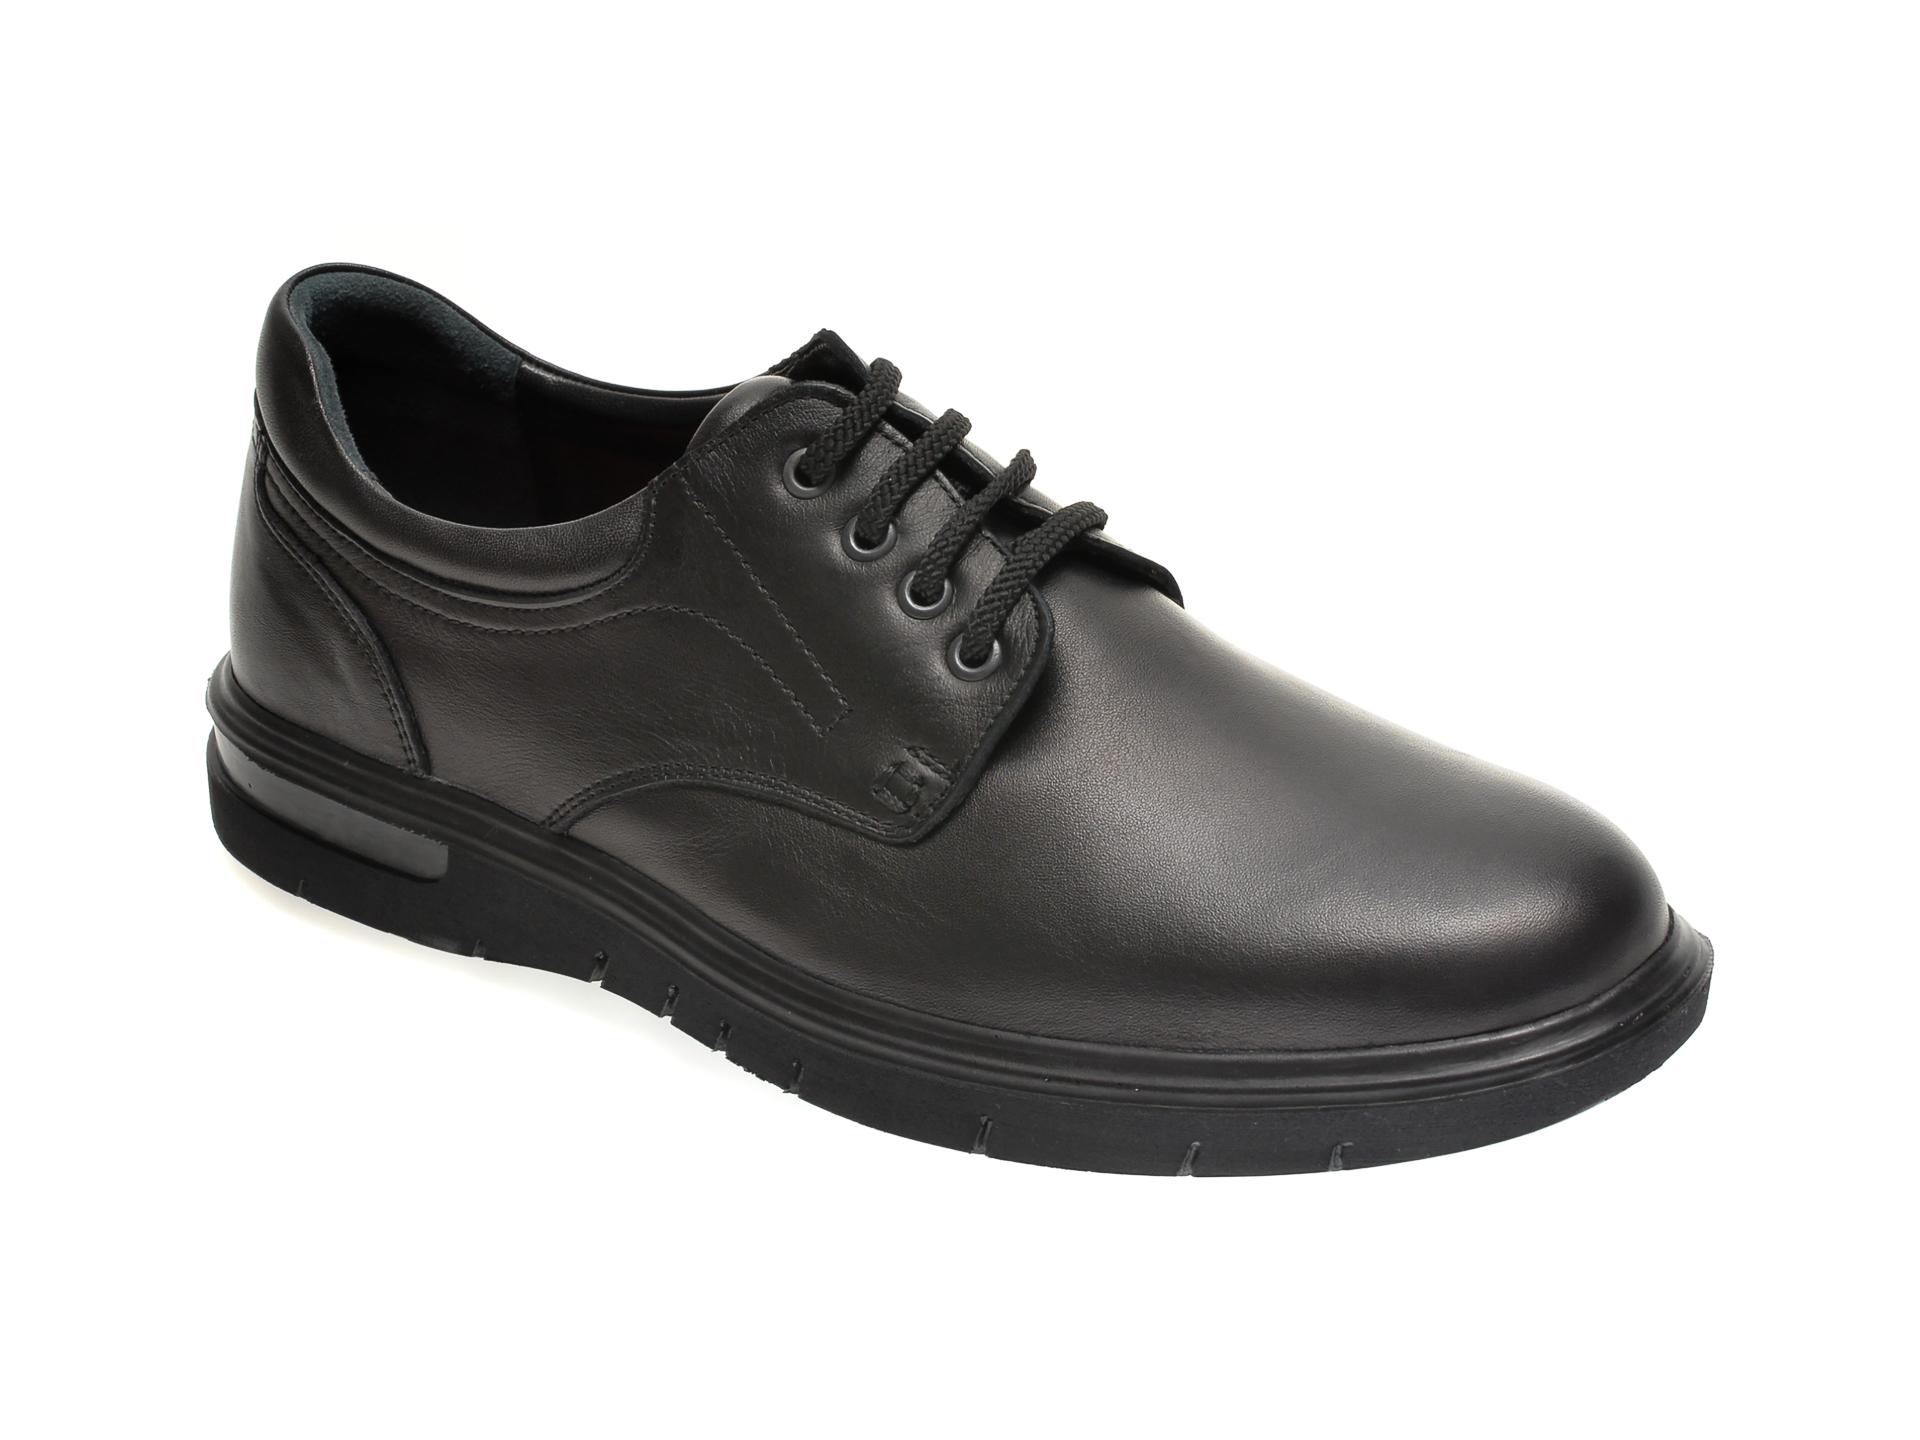 Pantofi Otter Negri, 2804, Din Piele Naturala